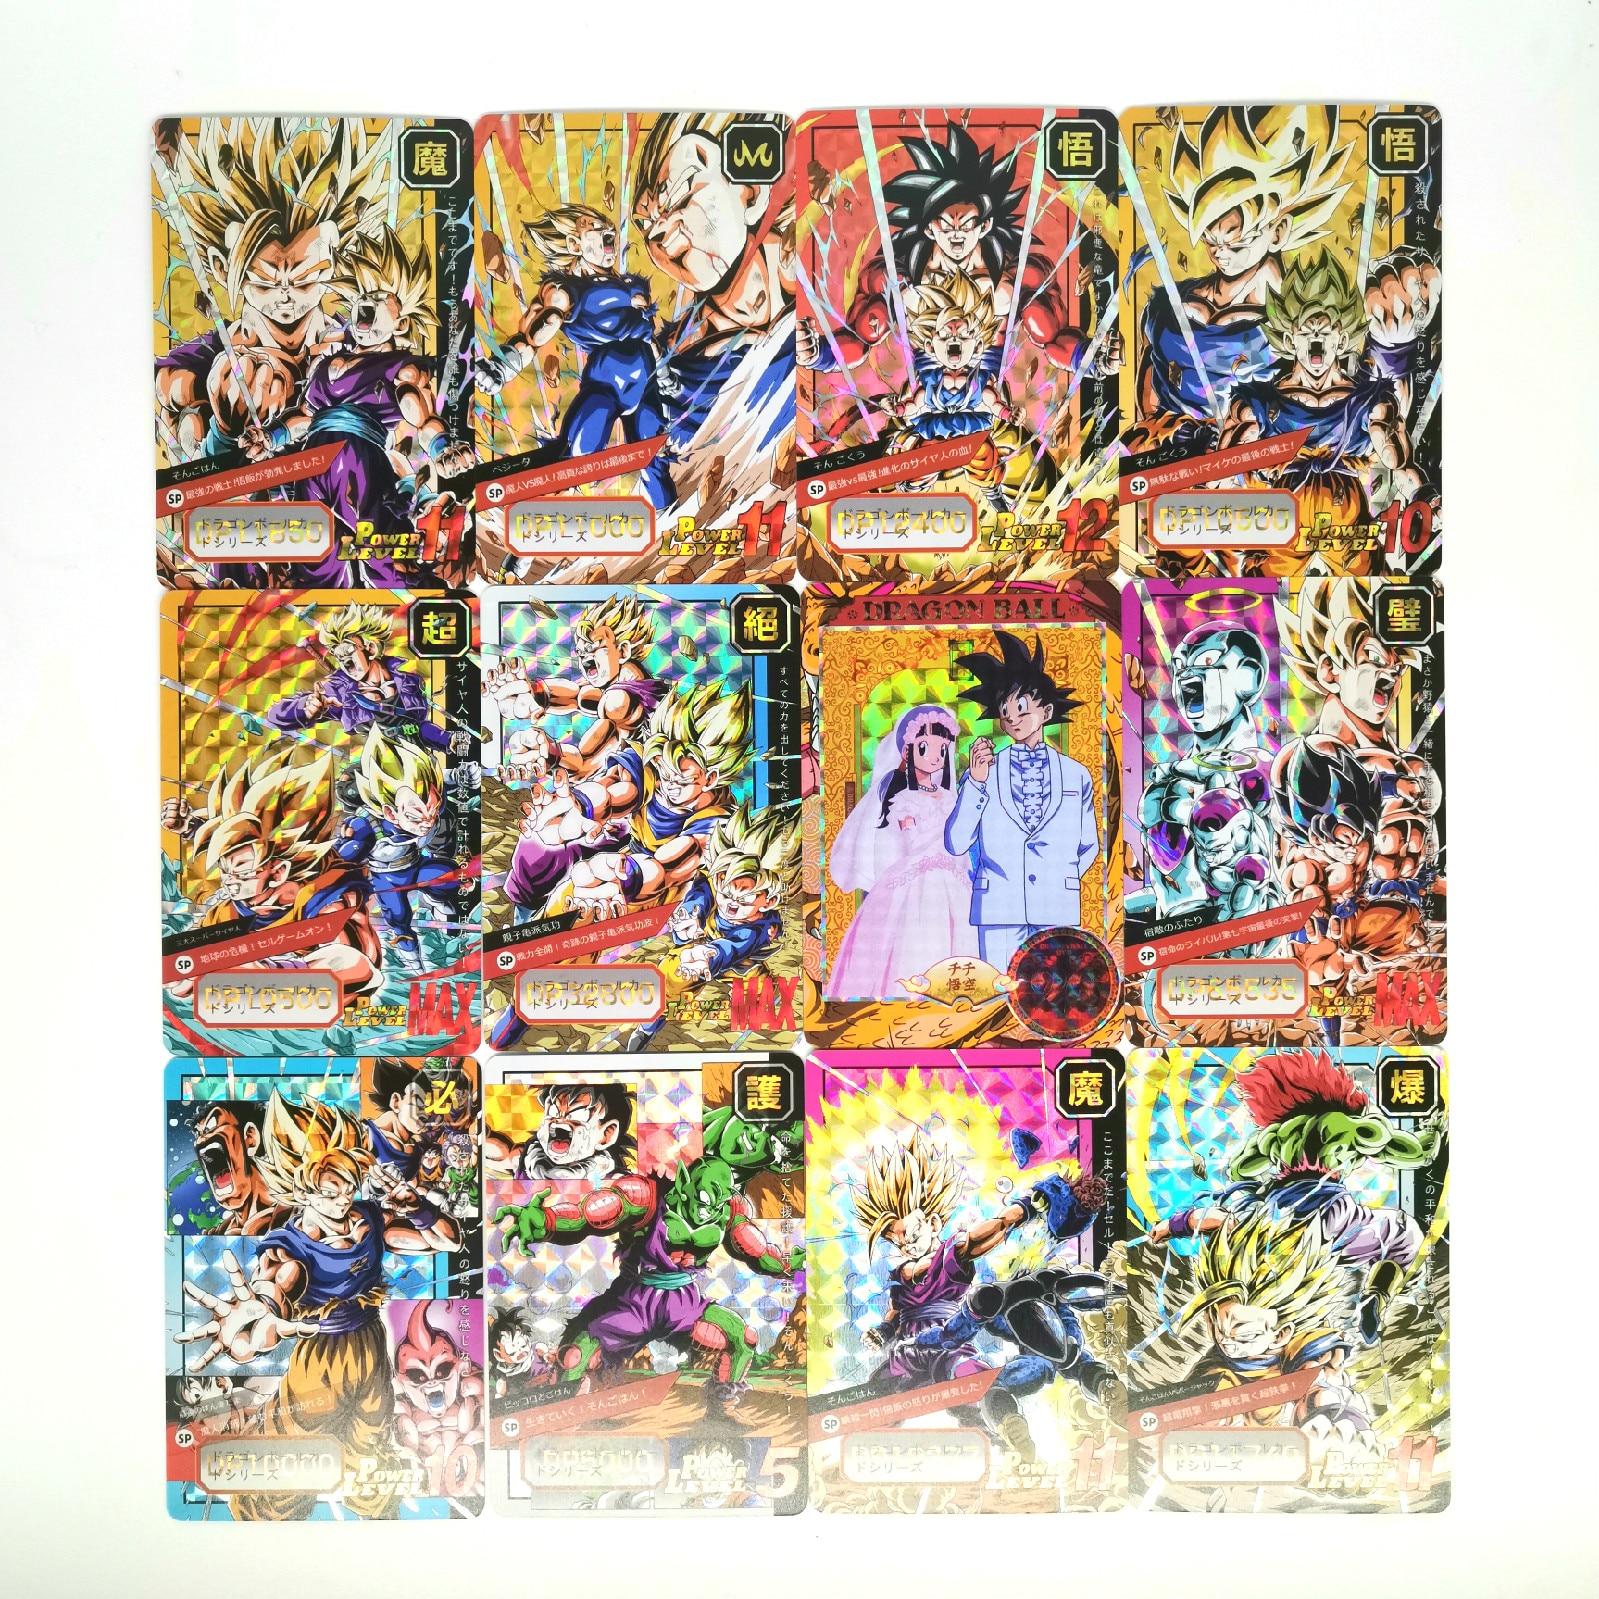 New 29pcs Super Dragon Ball Z Heroes Battle Card Ultra Instinct Goku Vegeta Game Collection Cards